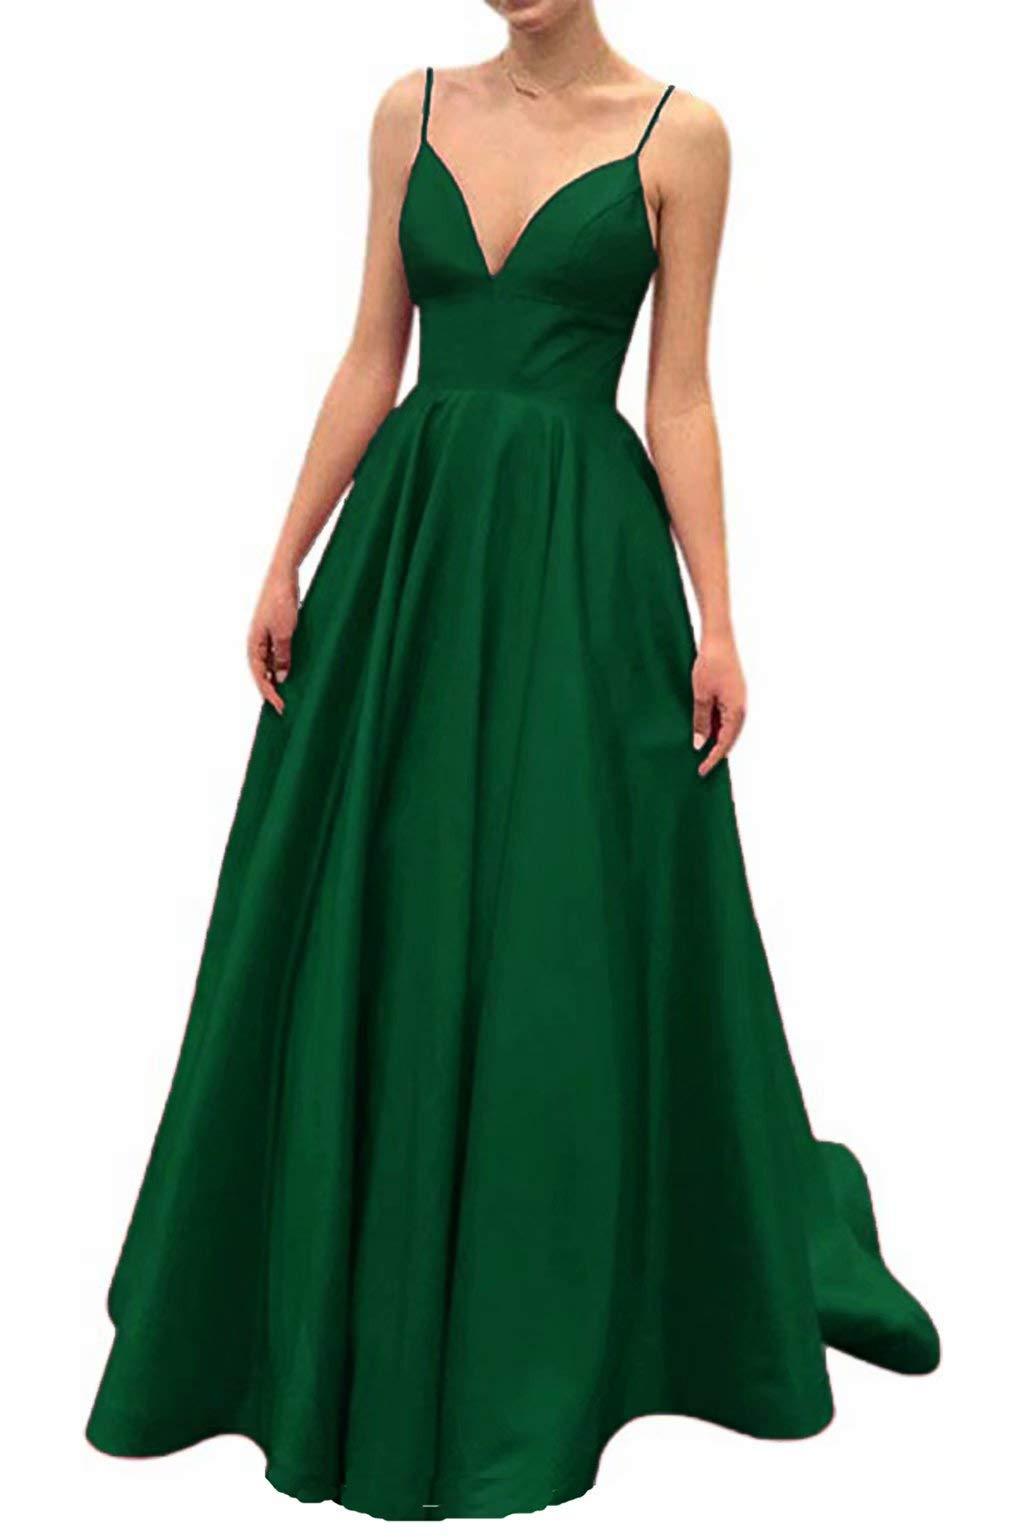 united states cheap prices better Ri Yun Women's Spaghetti Strap V Neck Prom Dresses Long 2019 Satin ...